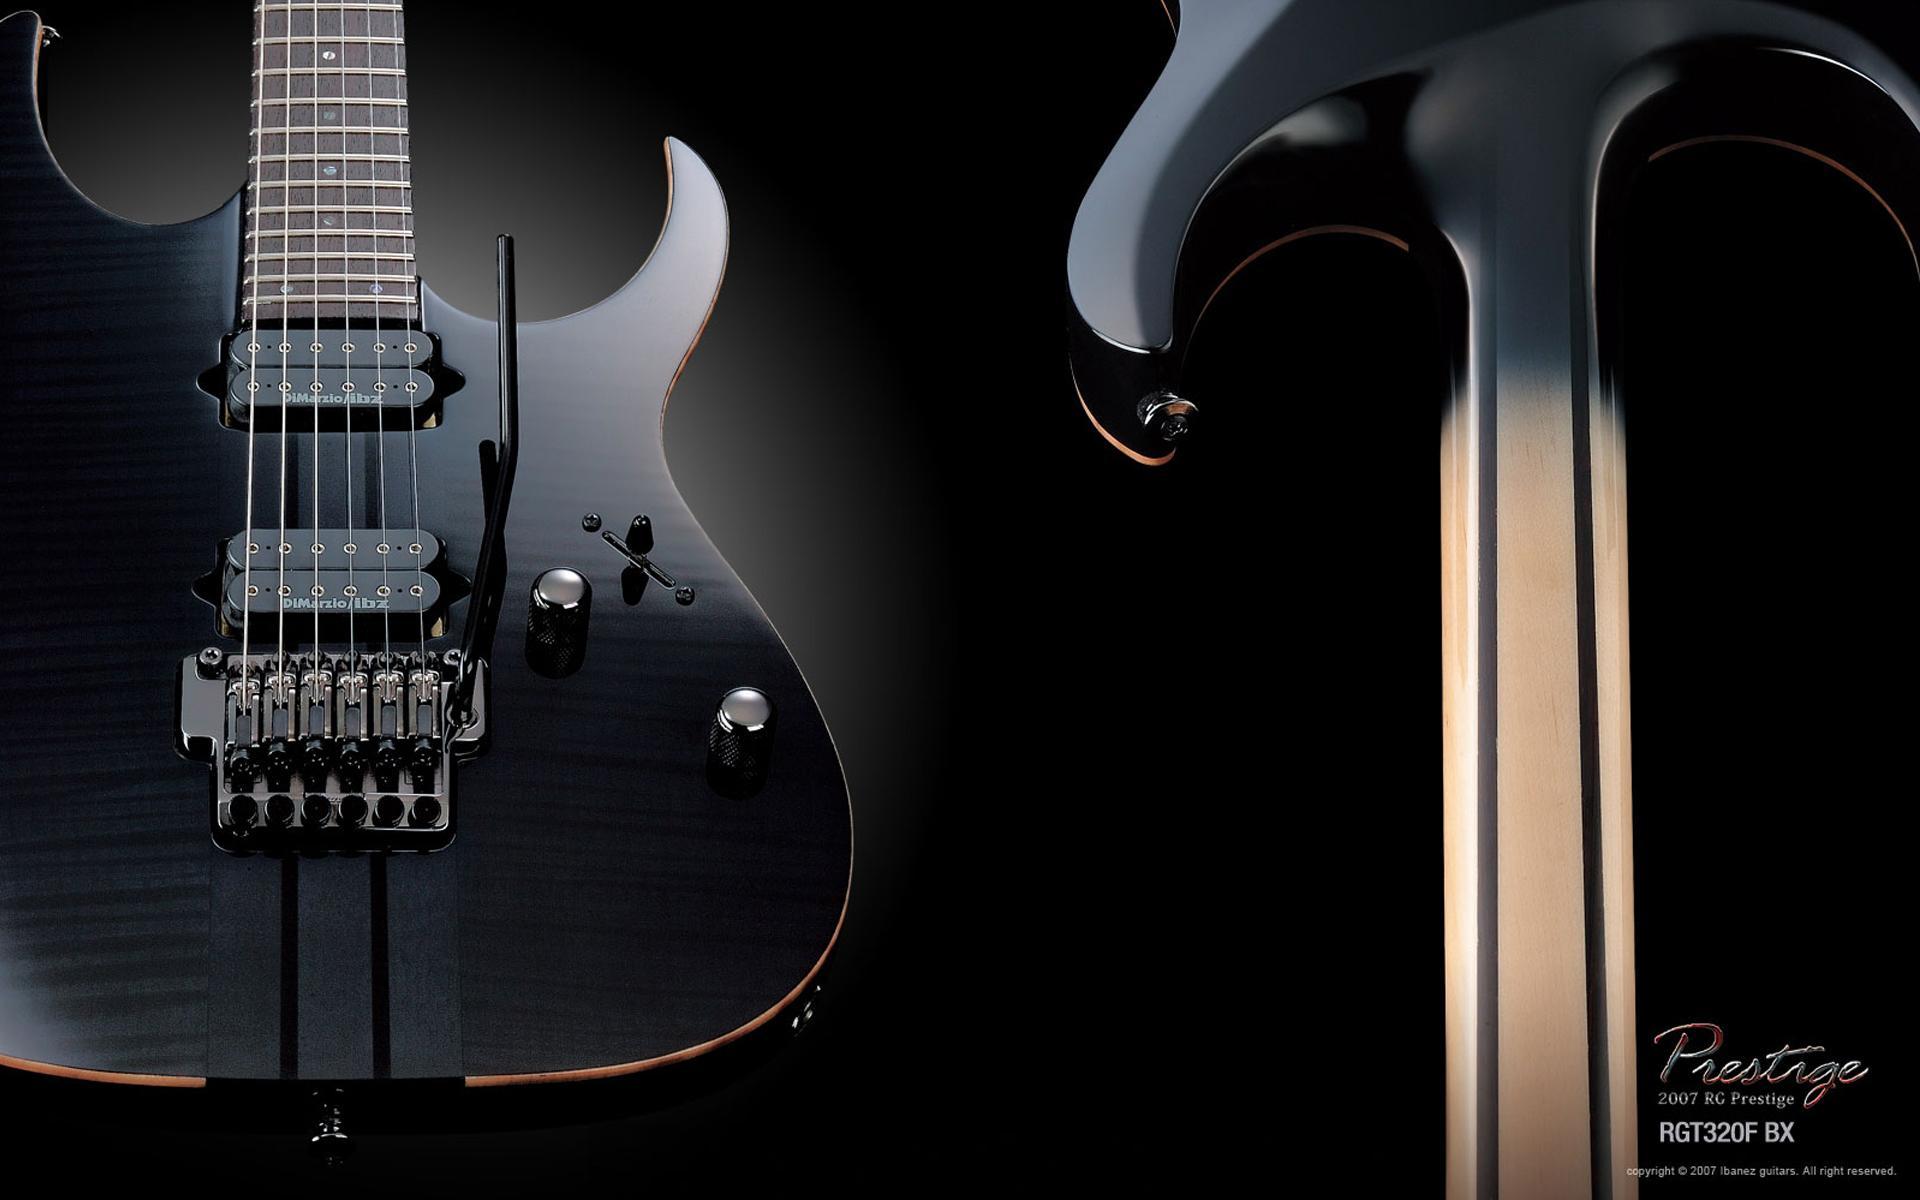 ibanez bass guitar wallpaperon - photo #2